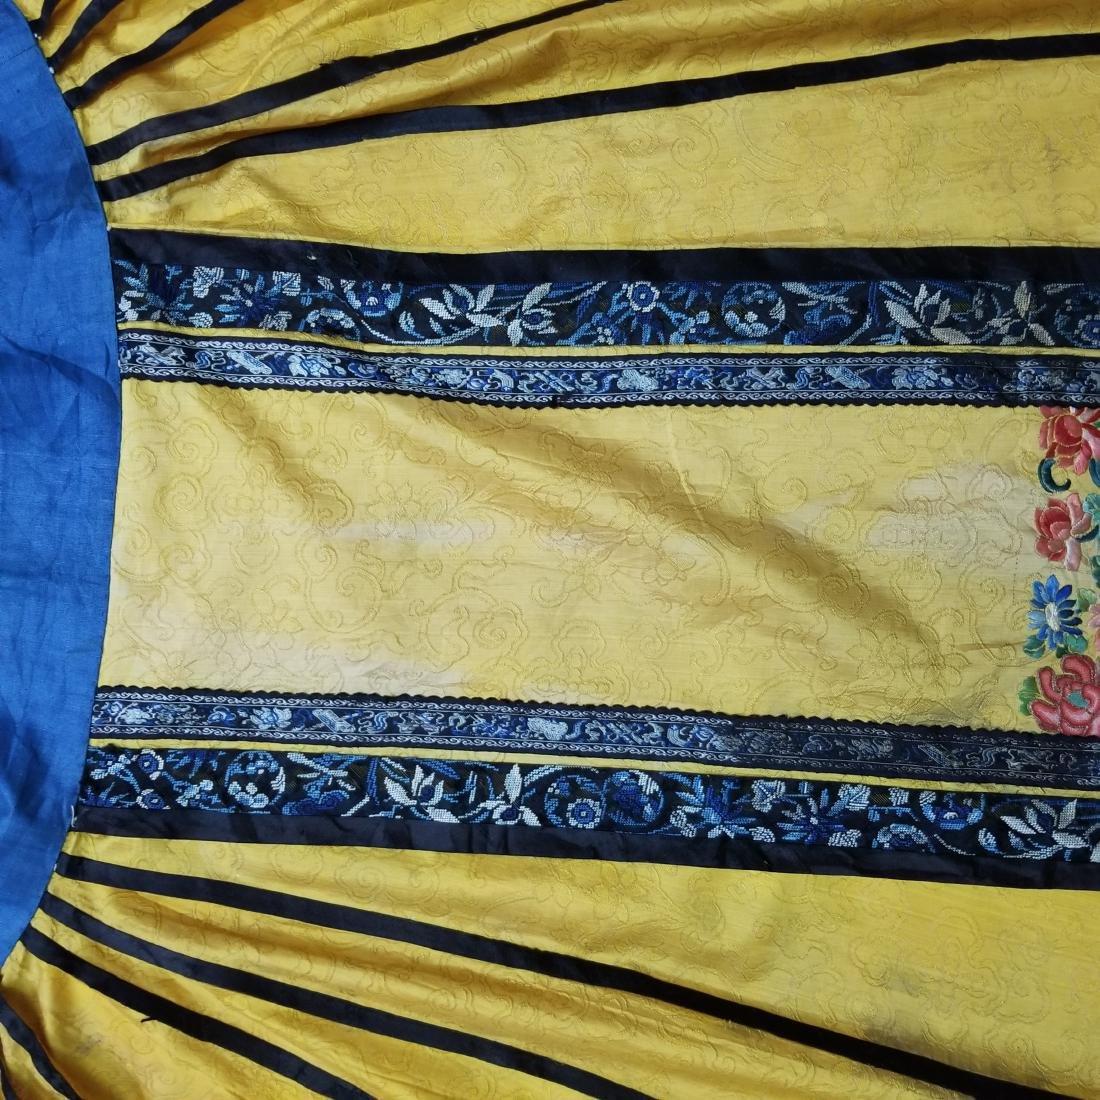 Antique Chinese Silk Hand Embroidered Skirt Forbidden - 9